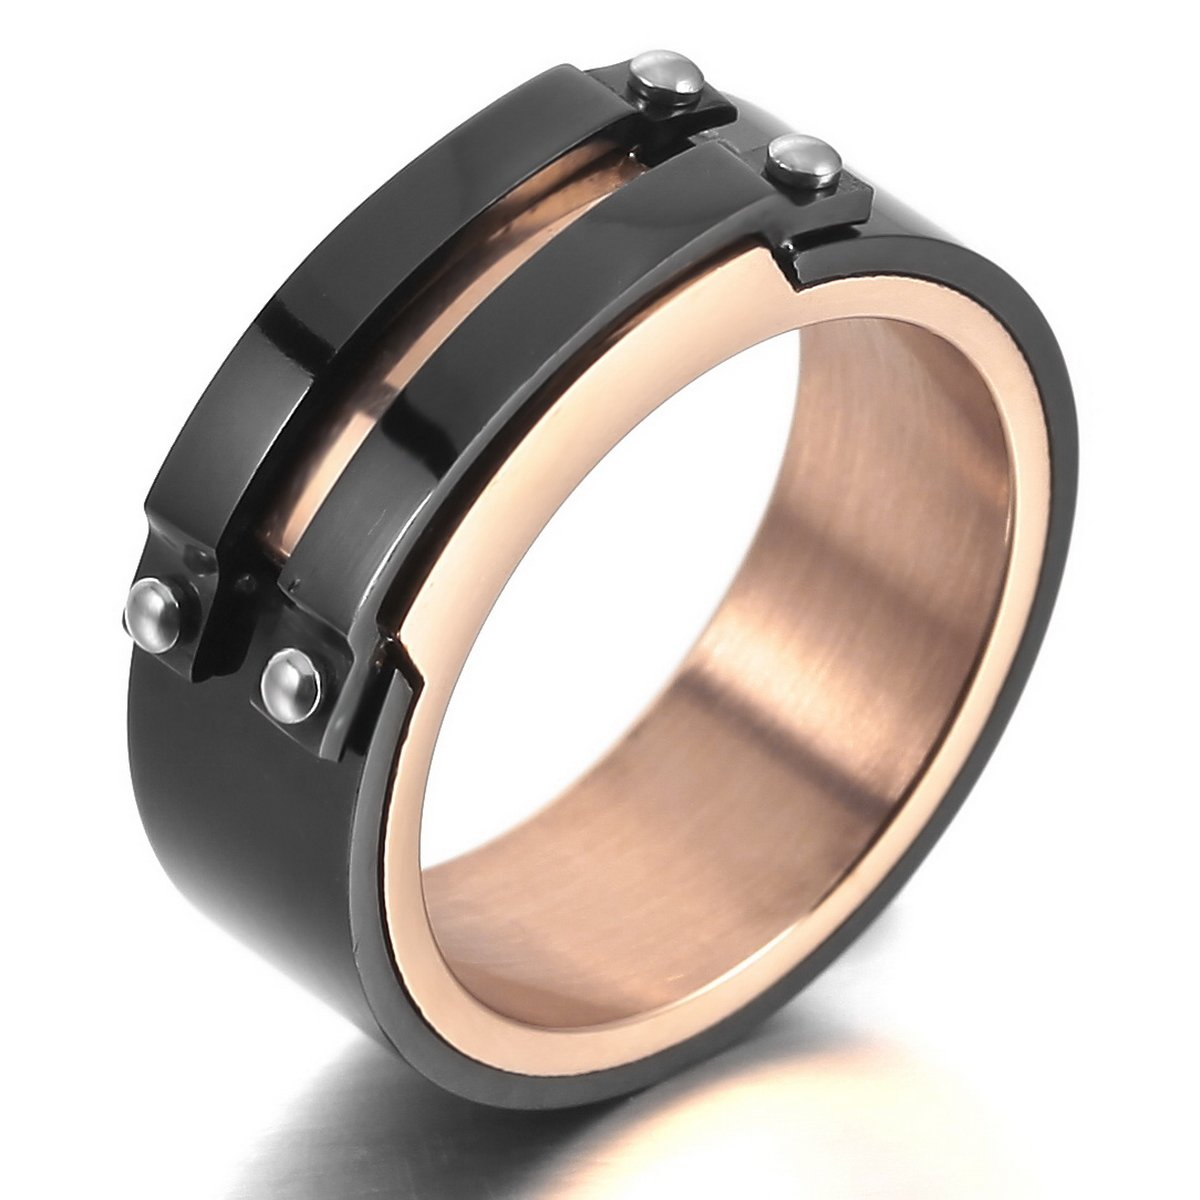 MunkiMix Acero Inoxidable Anillo Ring Banda Venda Negro Oro Dorado Tono Hombre ve846-parent